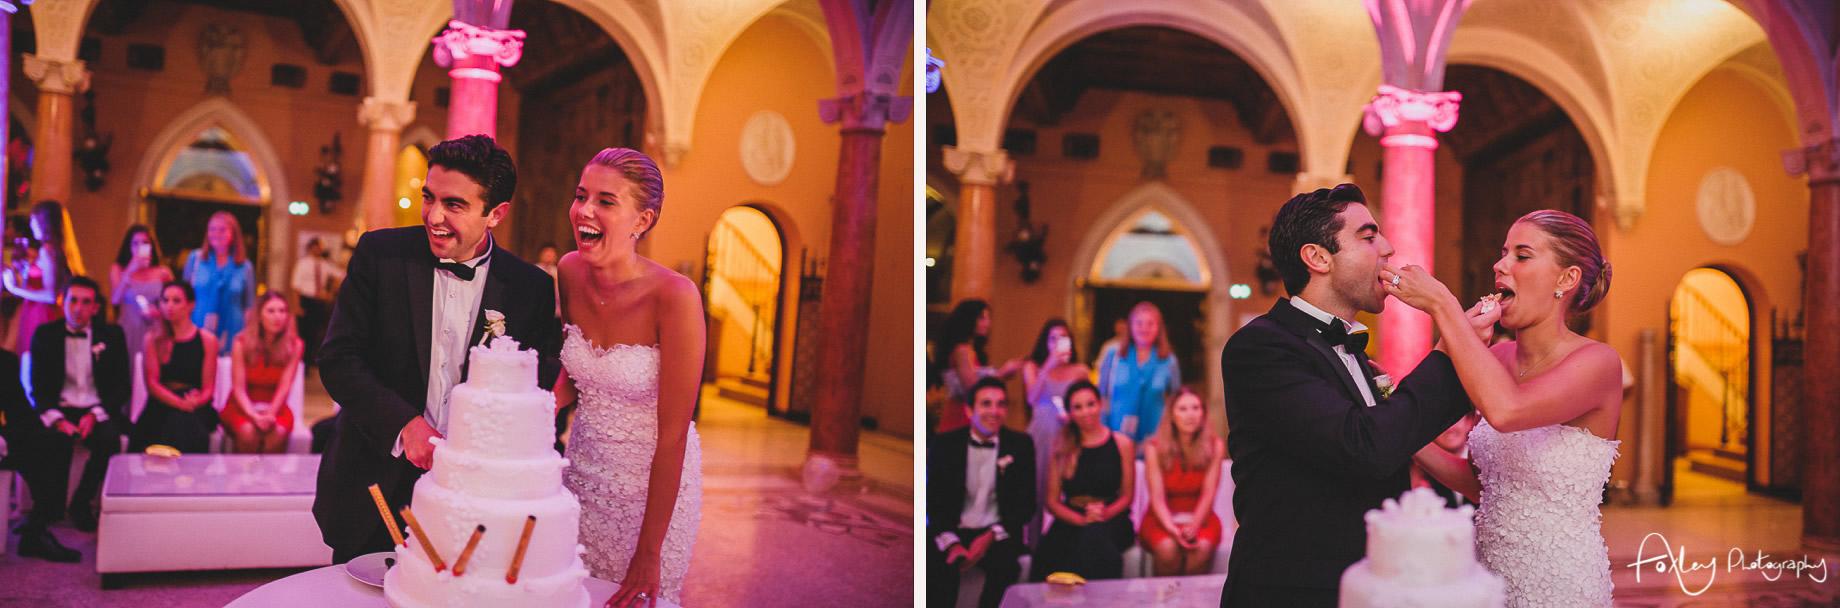 Jil and Will's Wedding at Villa Ephrussi De Rothschild 219